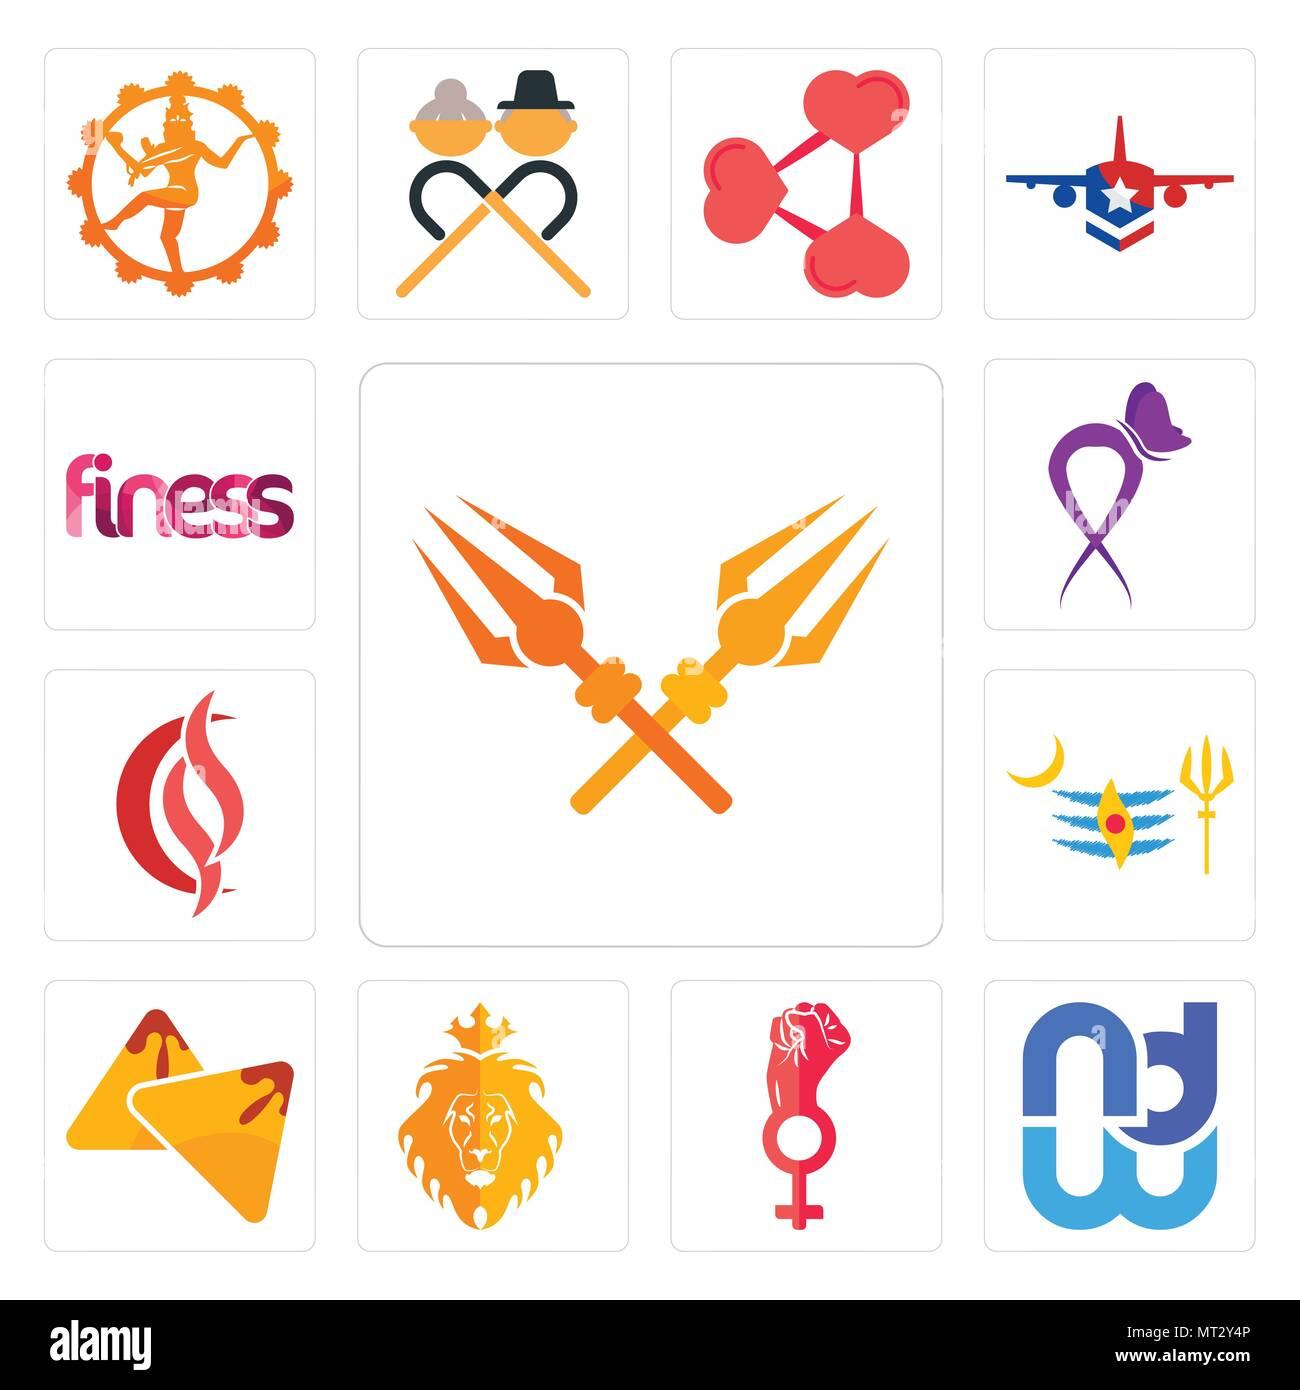 female empowerment symbols